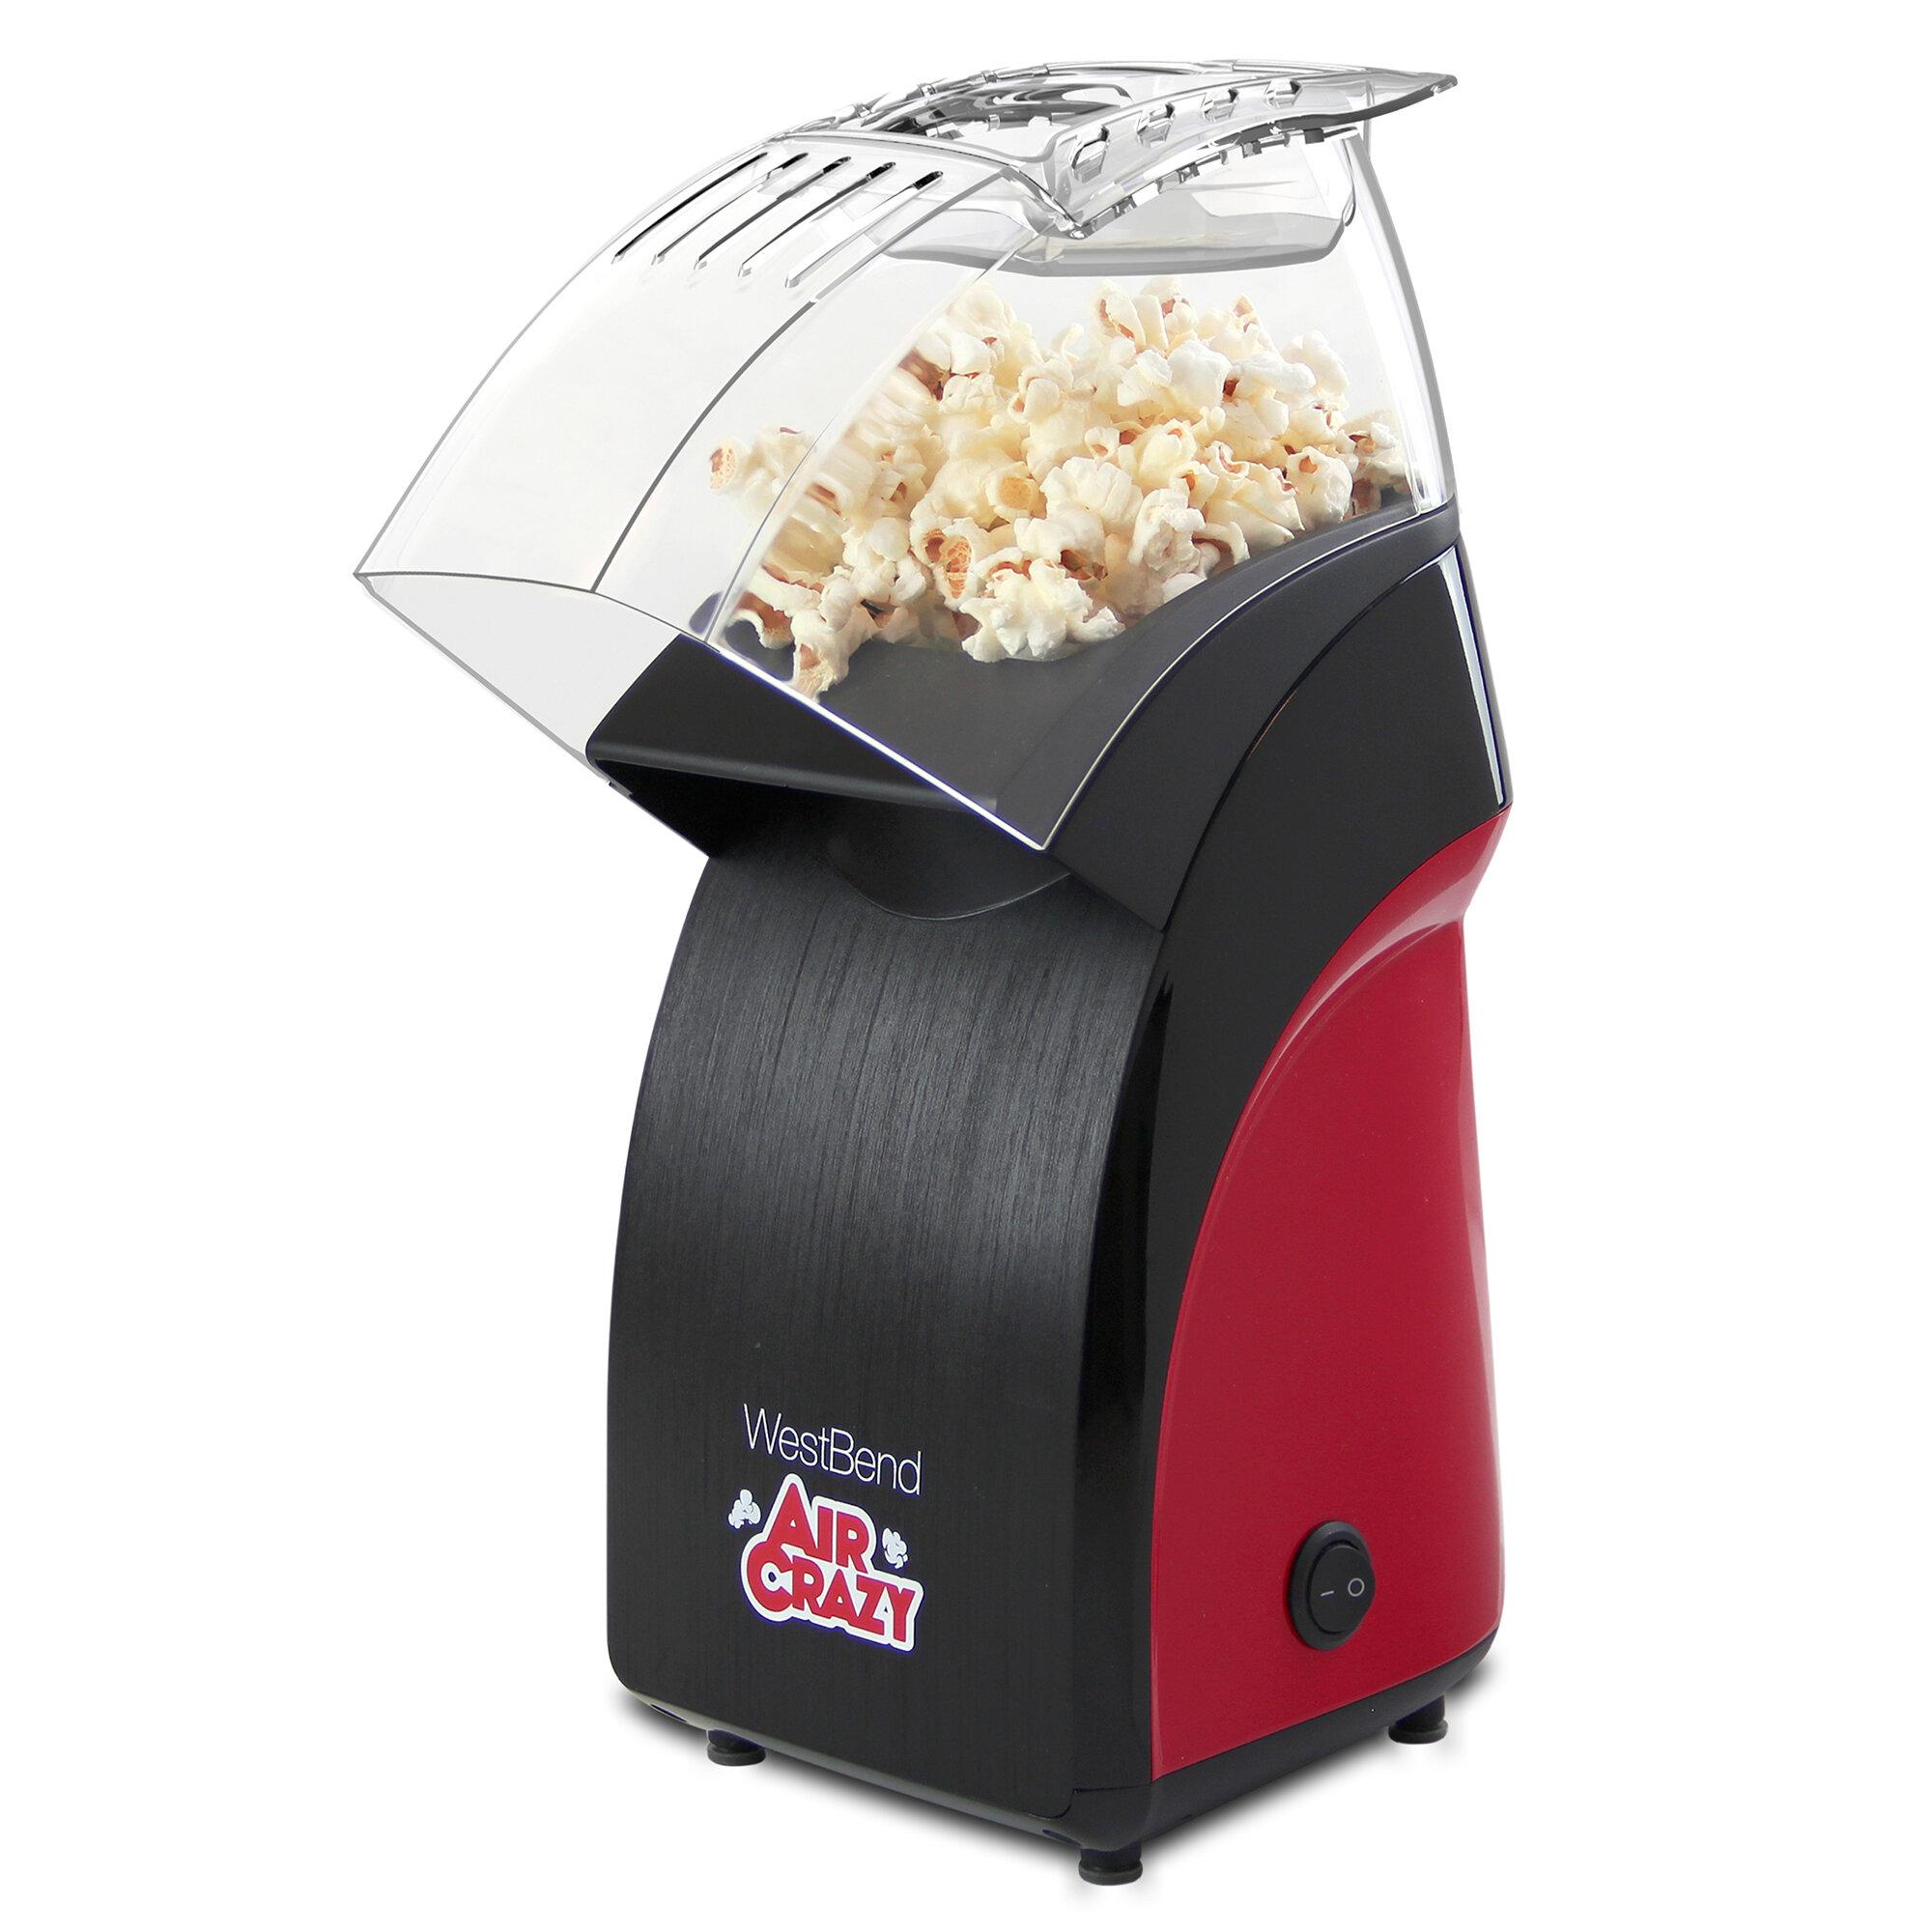 West Bend 4oz Air Crazy Popcorn Tabletop Popper Wayfair